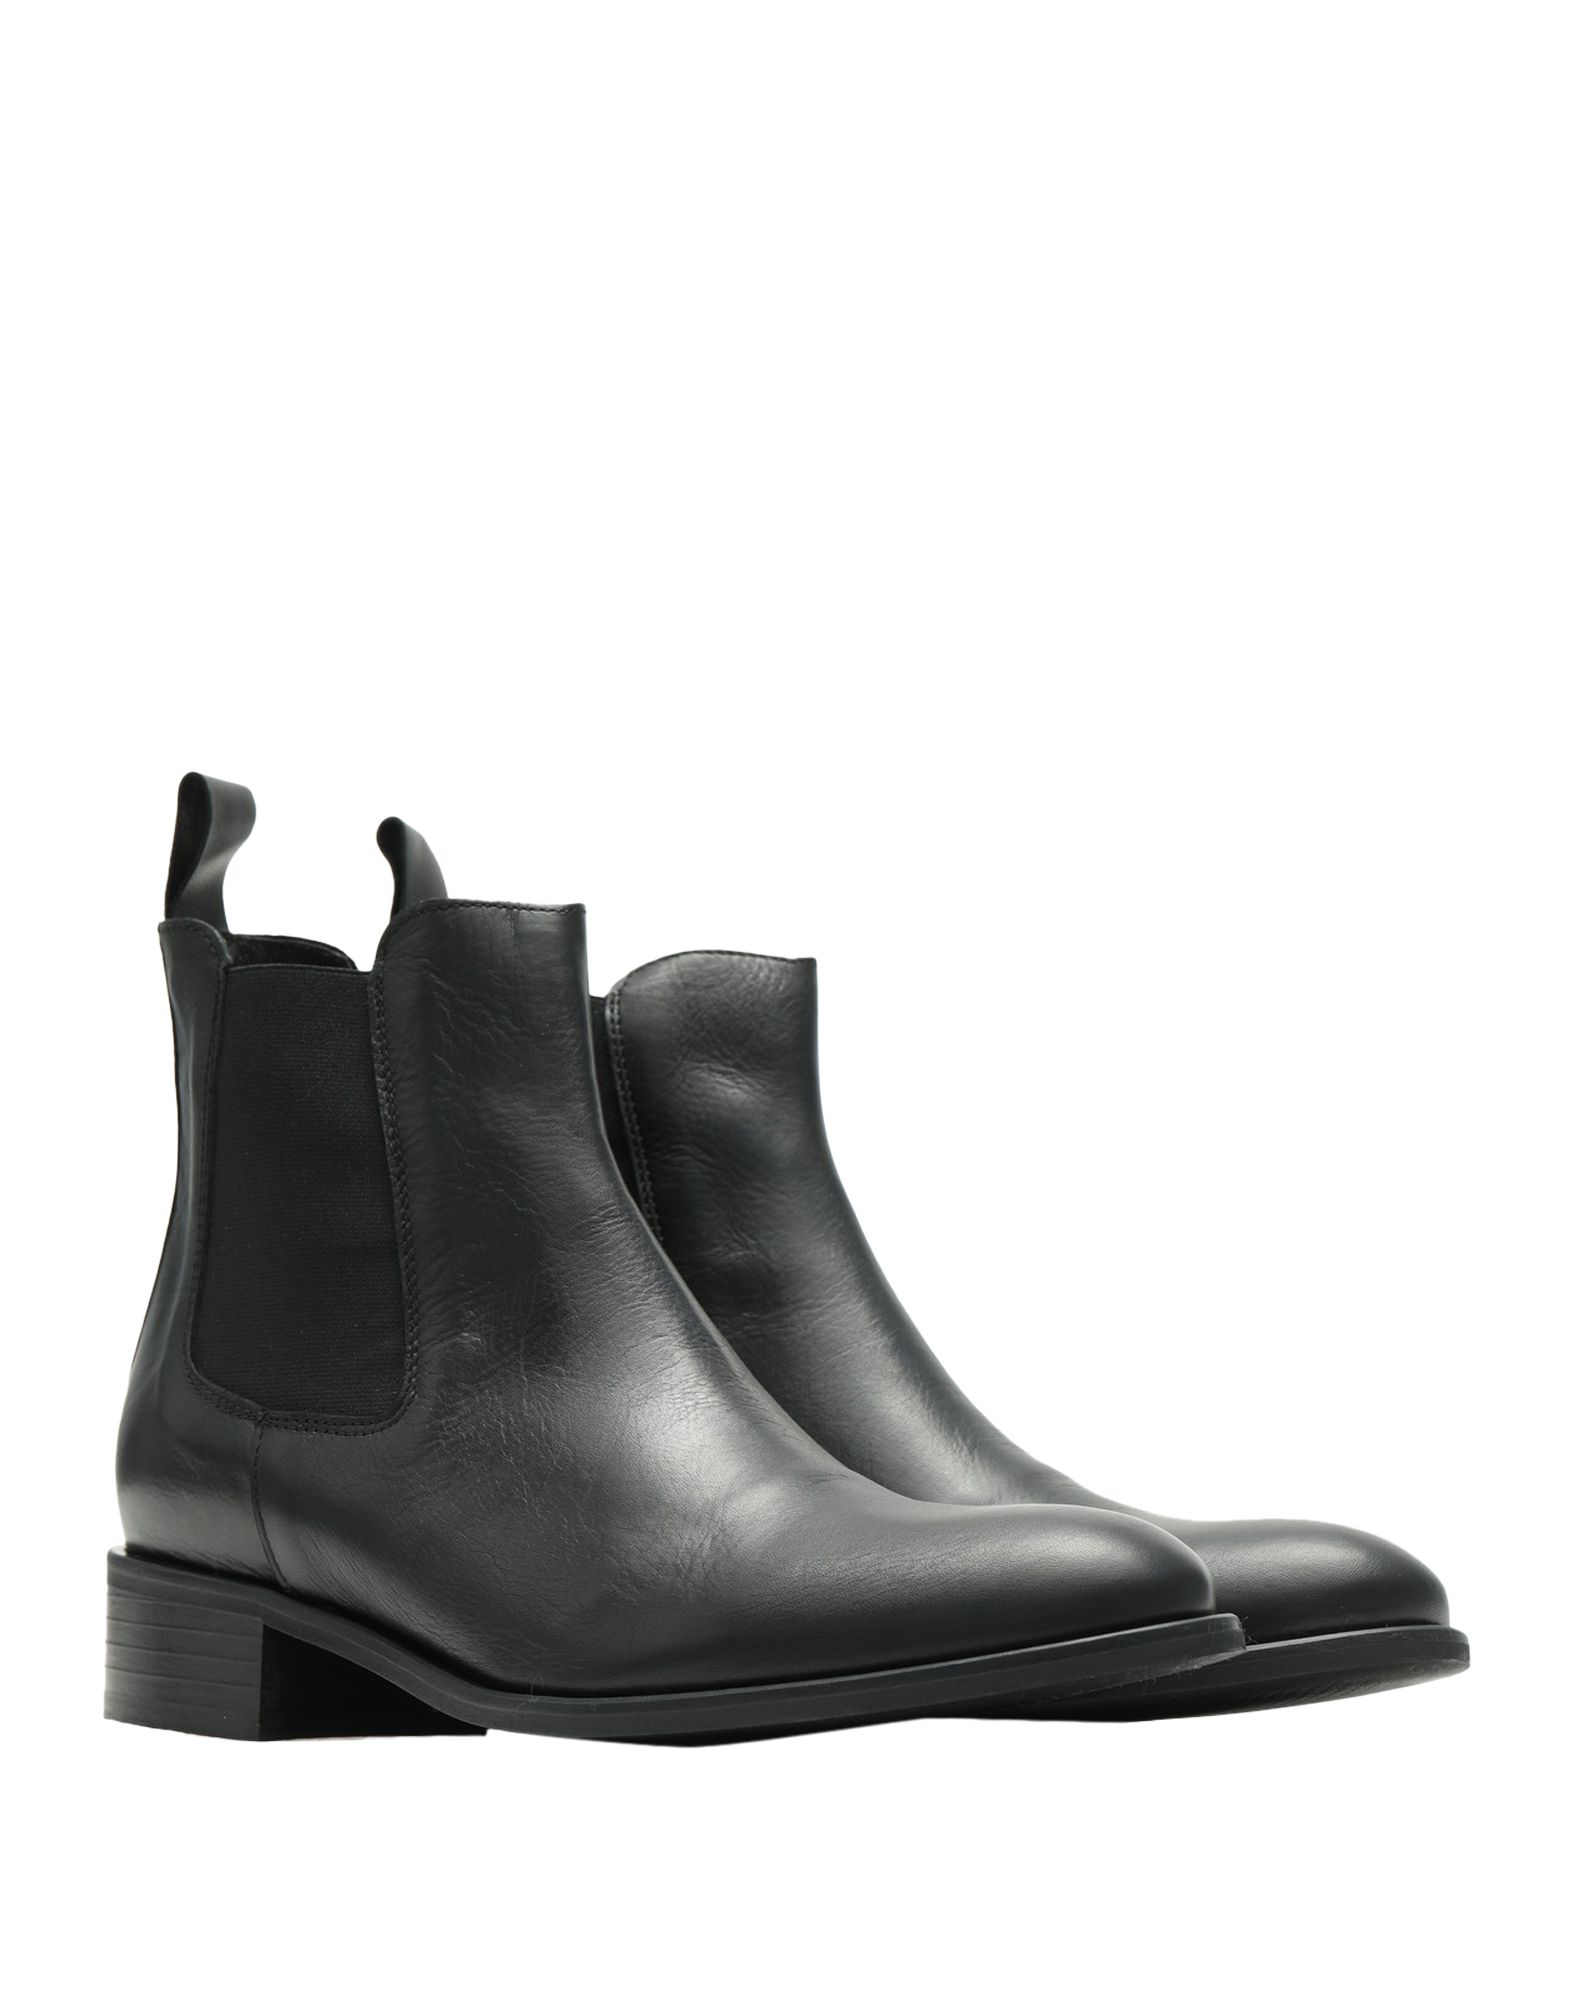 Stilvolle billige Schuhe Damen Leonardo Principi Chelsea Boots Damen Schuhe  11514406GG e22dde